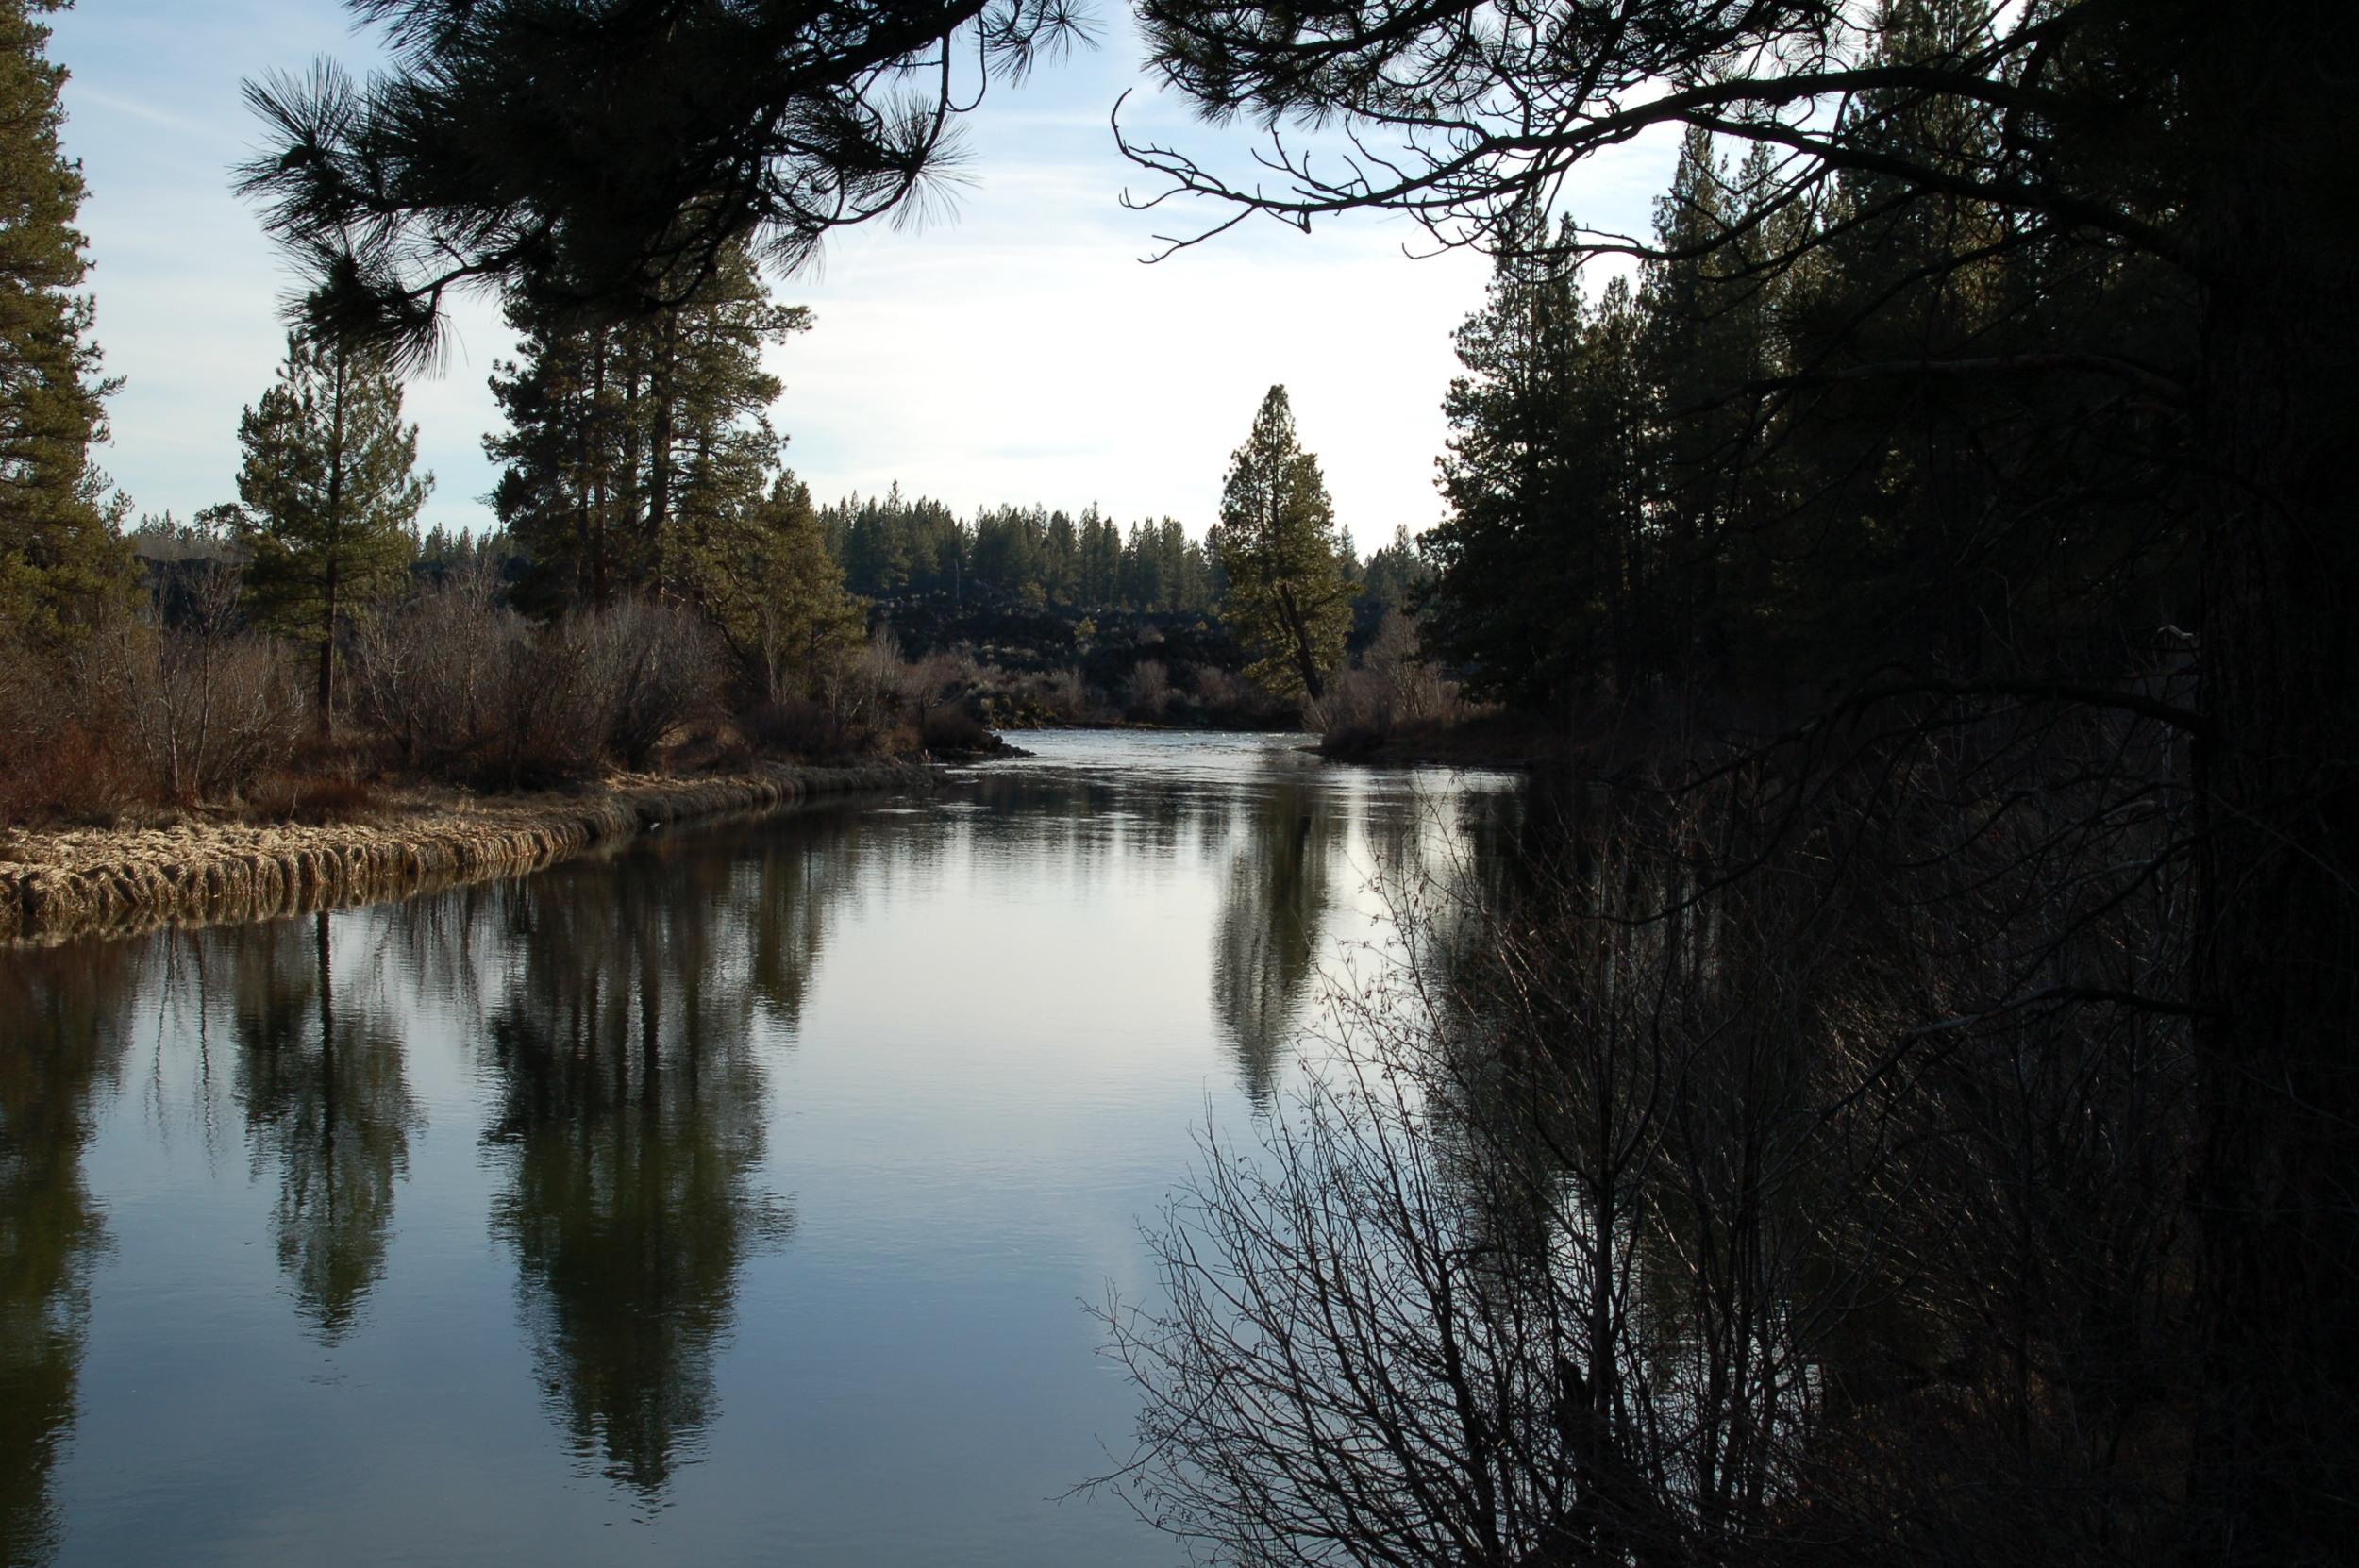 River in Bend, Oregon, one of my favorite spring break adventures